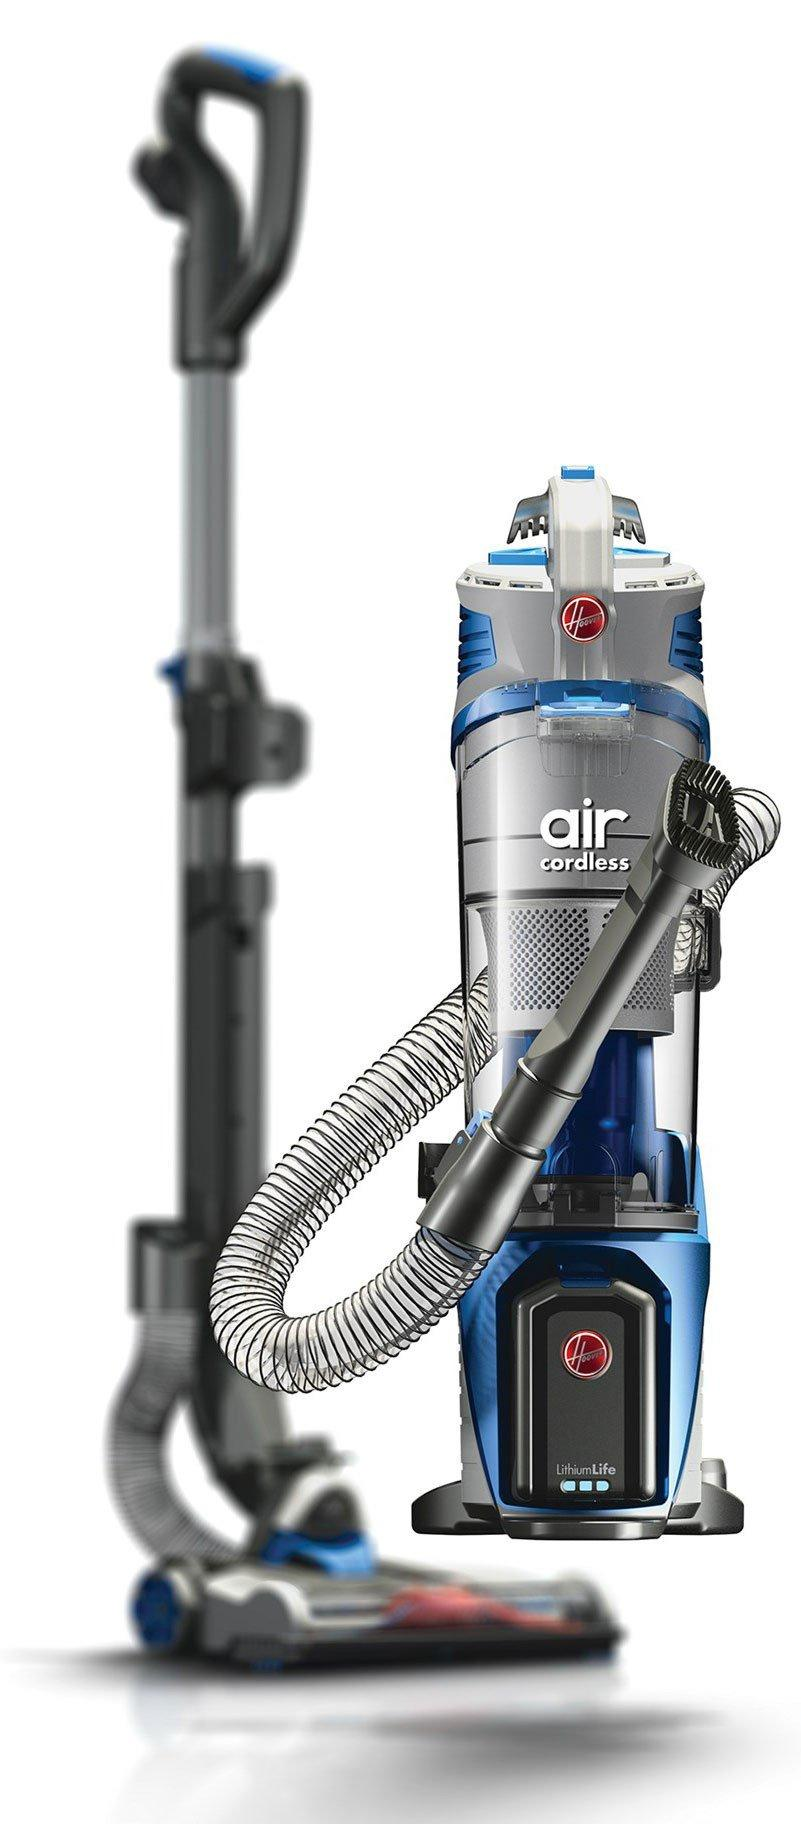 Hoover Air Cordless Lift Bagless Upright Vacuum Vacuum